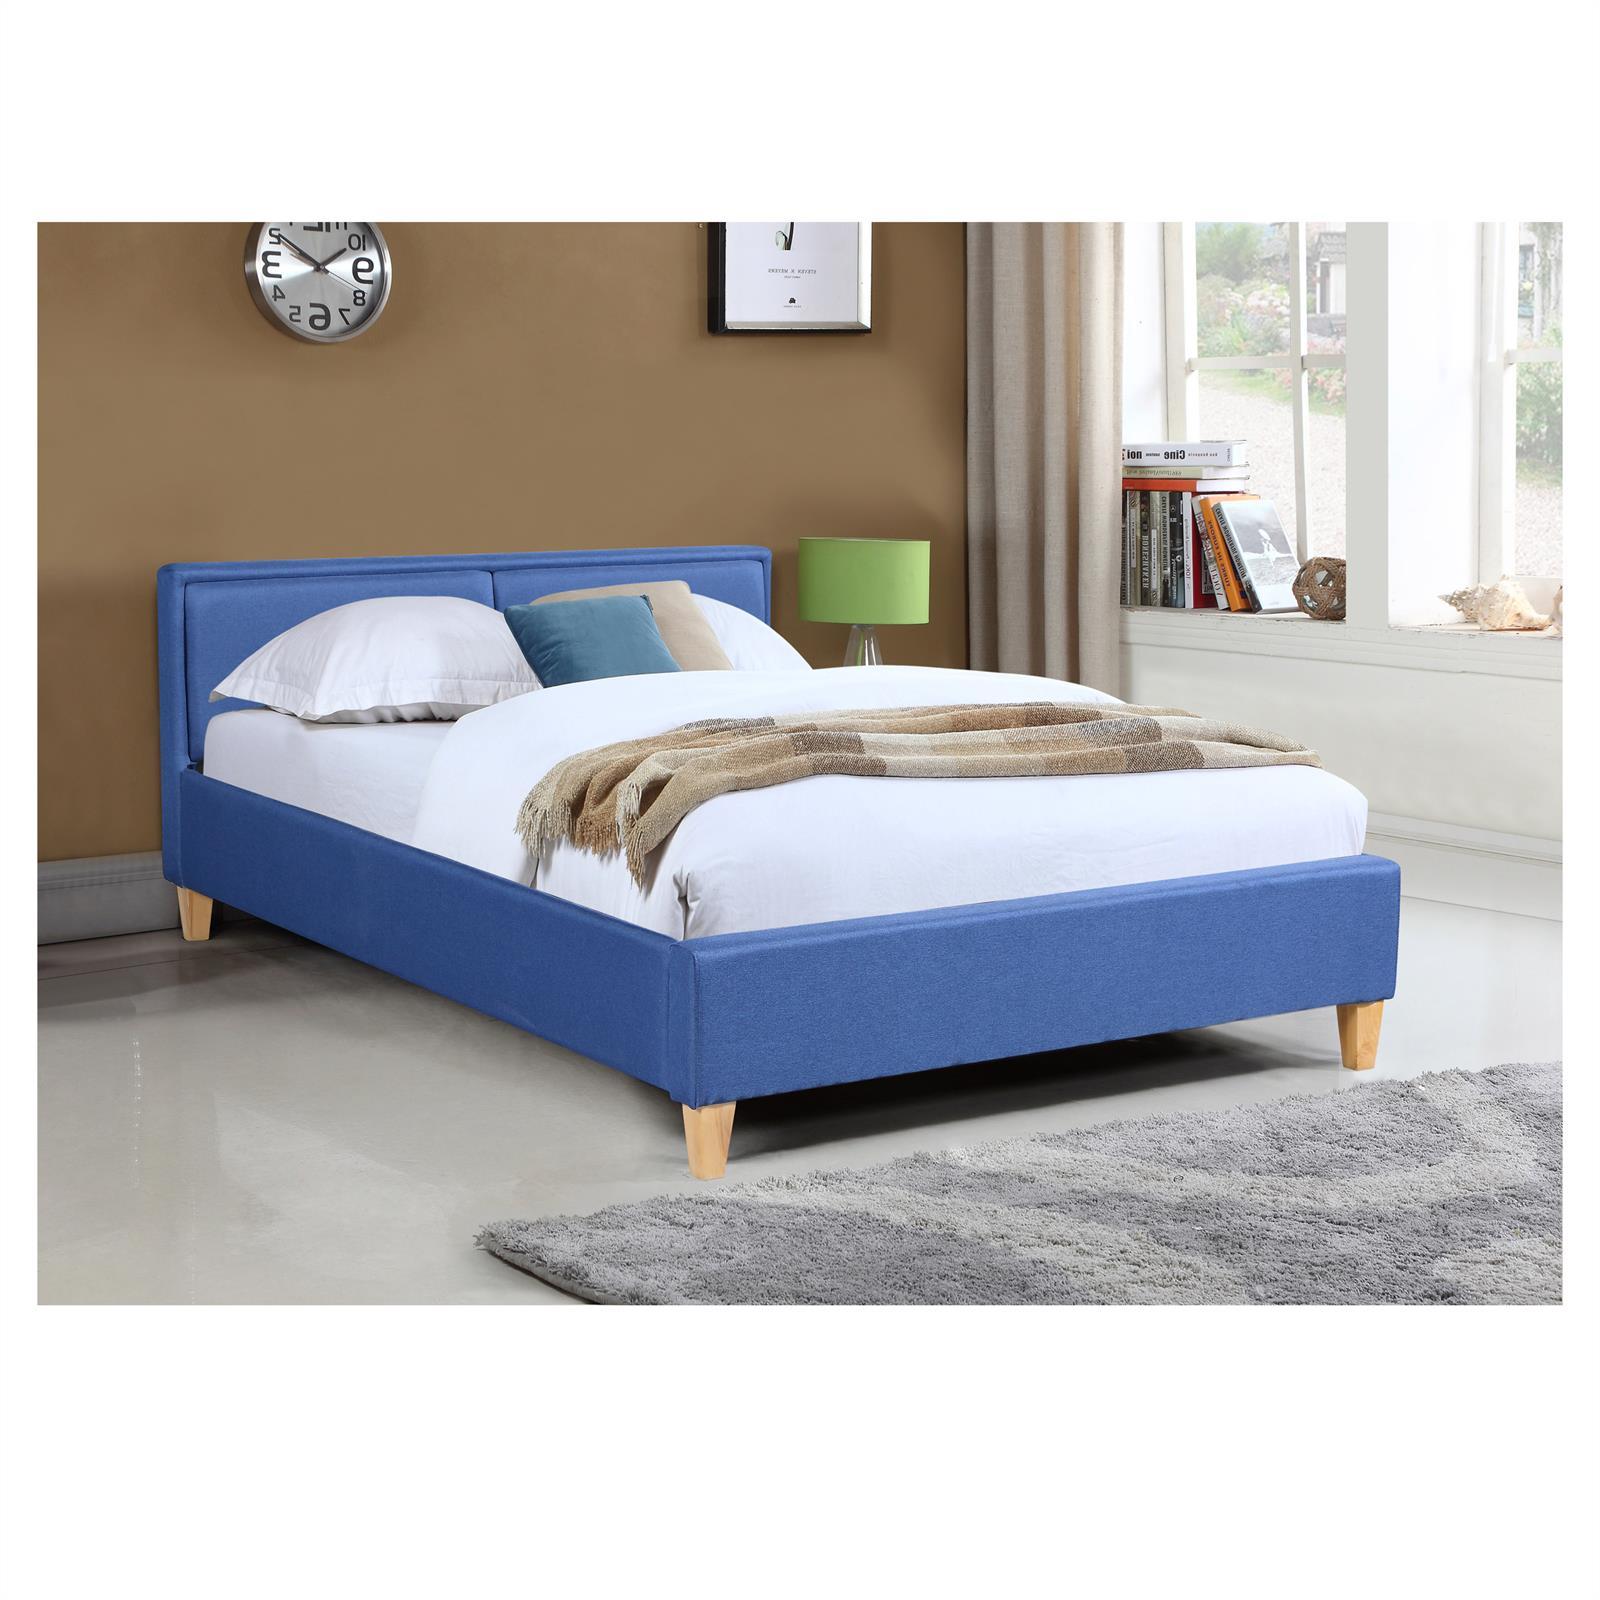 polsterbett doppelbett 140x200 cm inkl rollrost. Black Bedroom Furniture Sets. Home Design Ideas